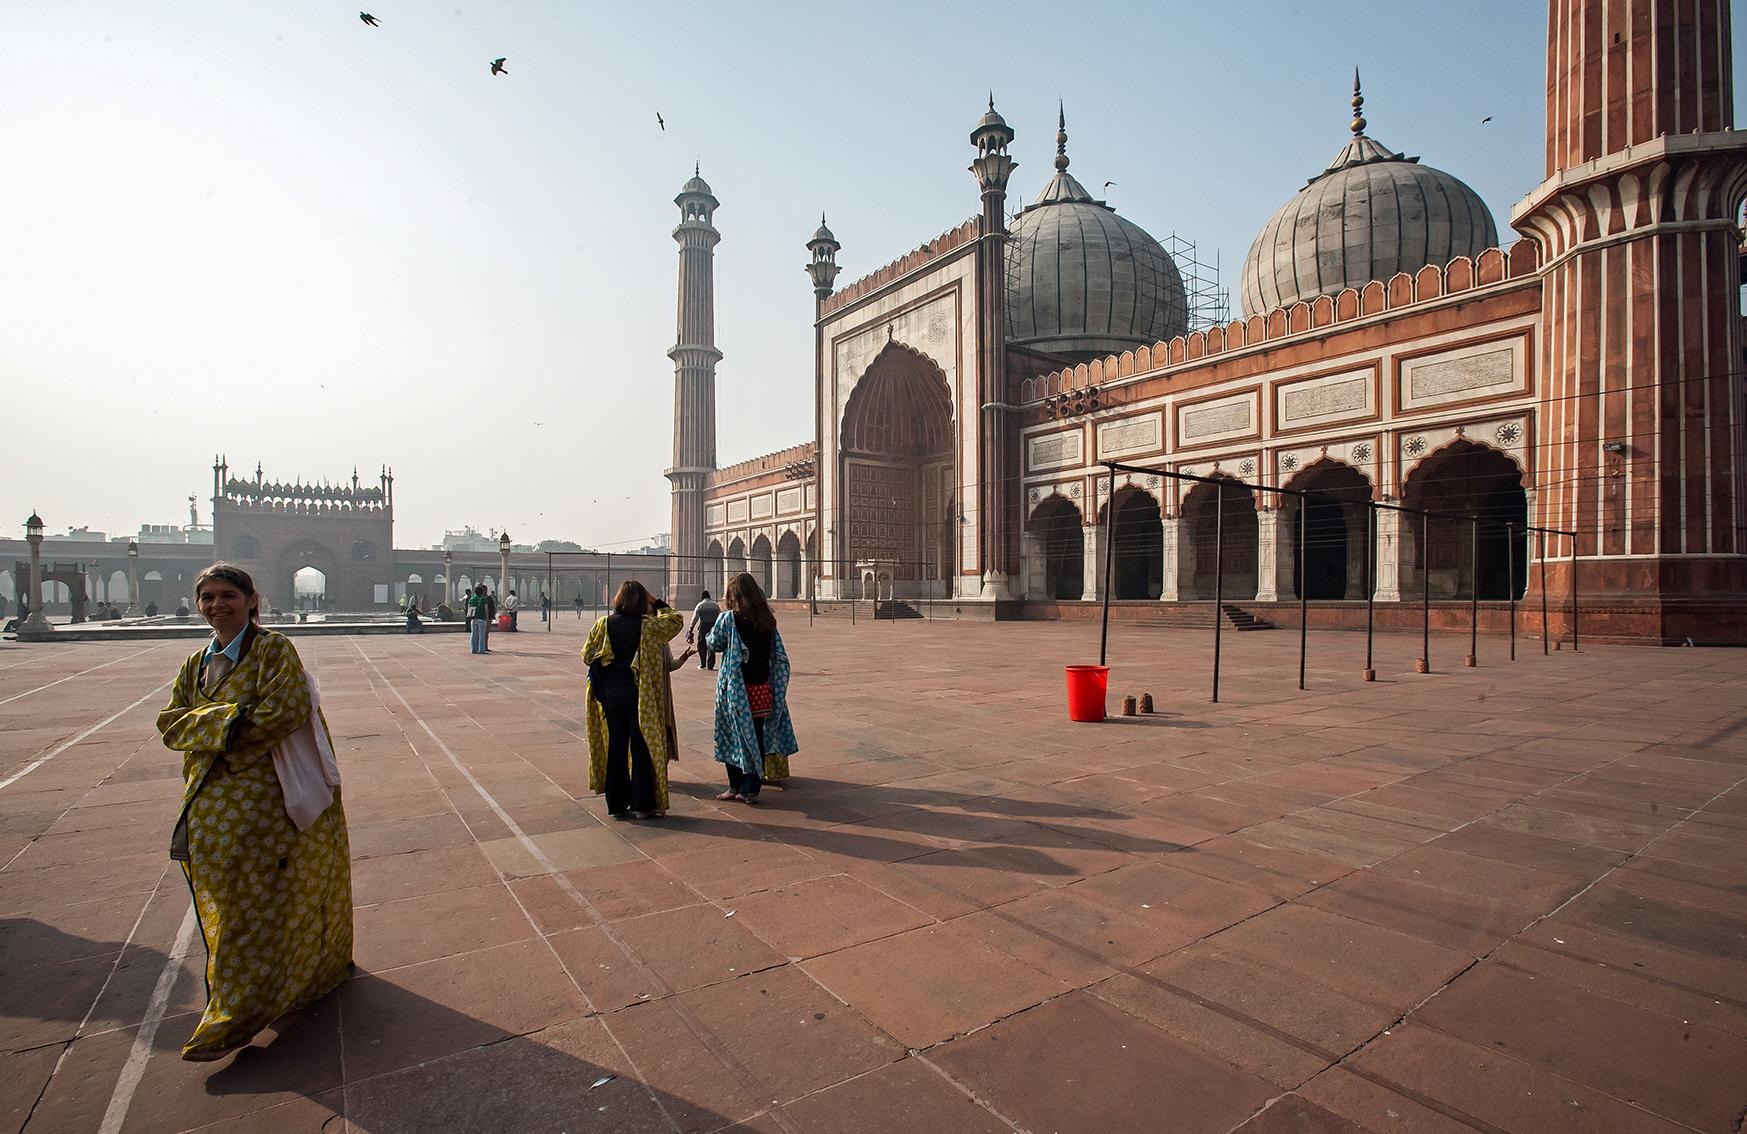 Jama Masjid, Friday Mosque, India